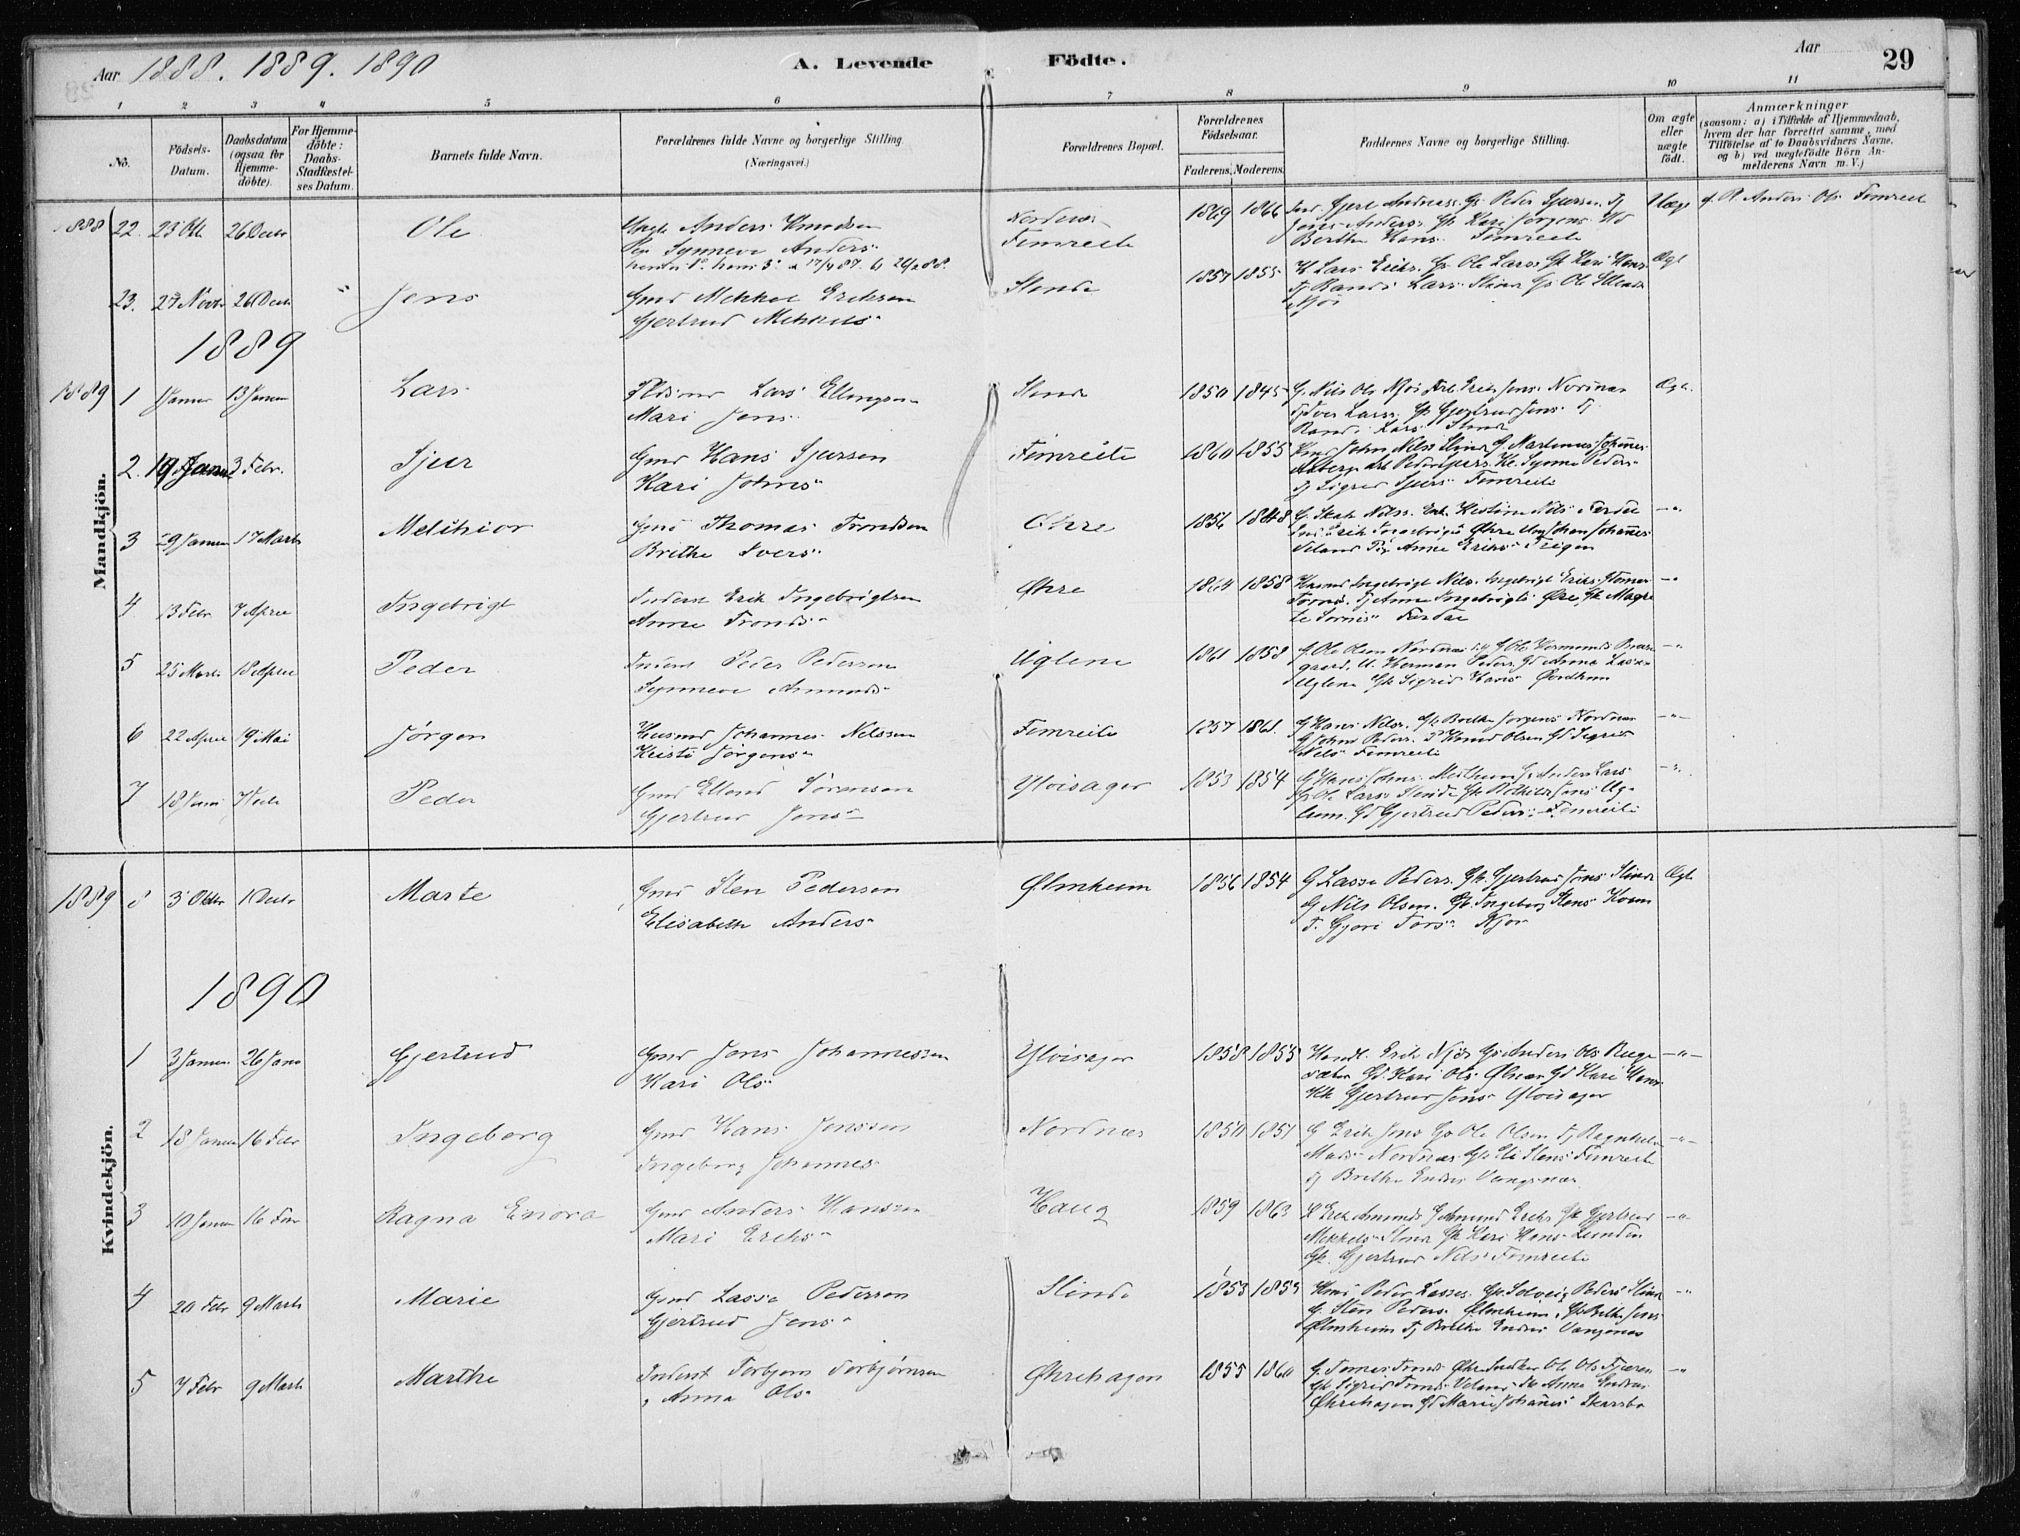 SAB, Sogndal Sokneprestembete, H/Haa/Haac/L0001: Ministerialbok nr. C 1, 1878-1907, s. 29